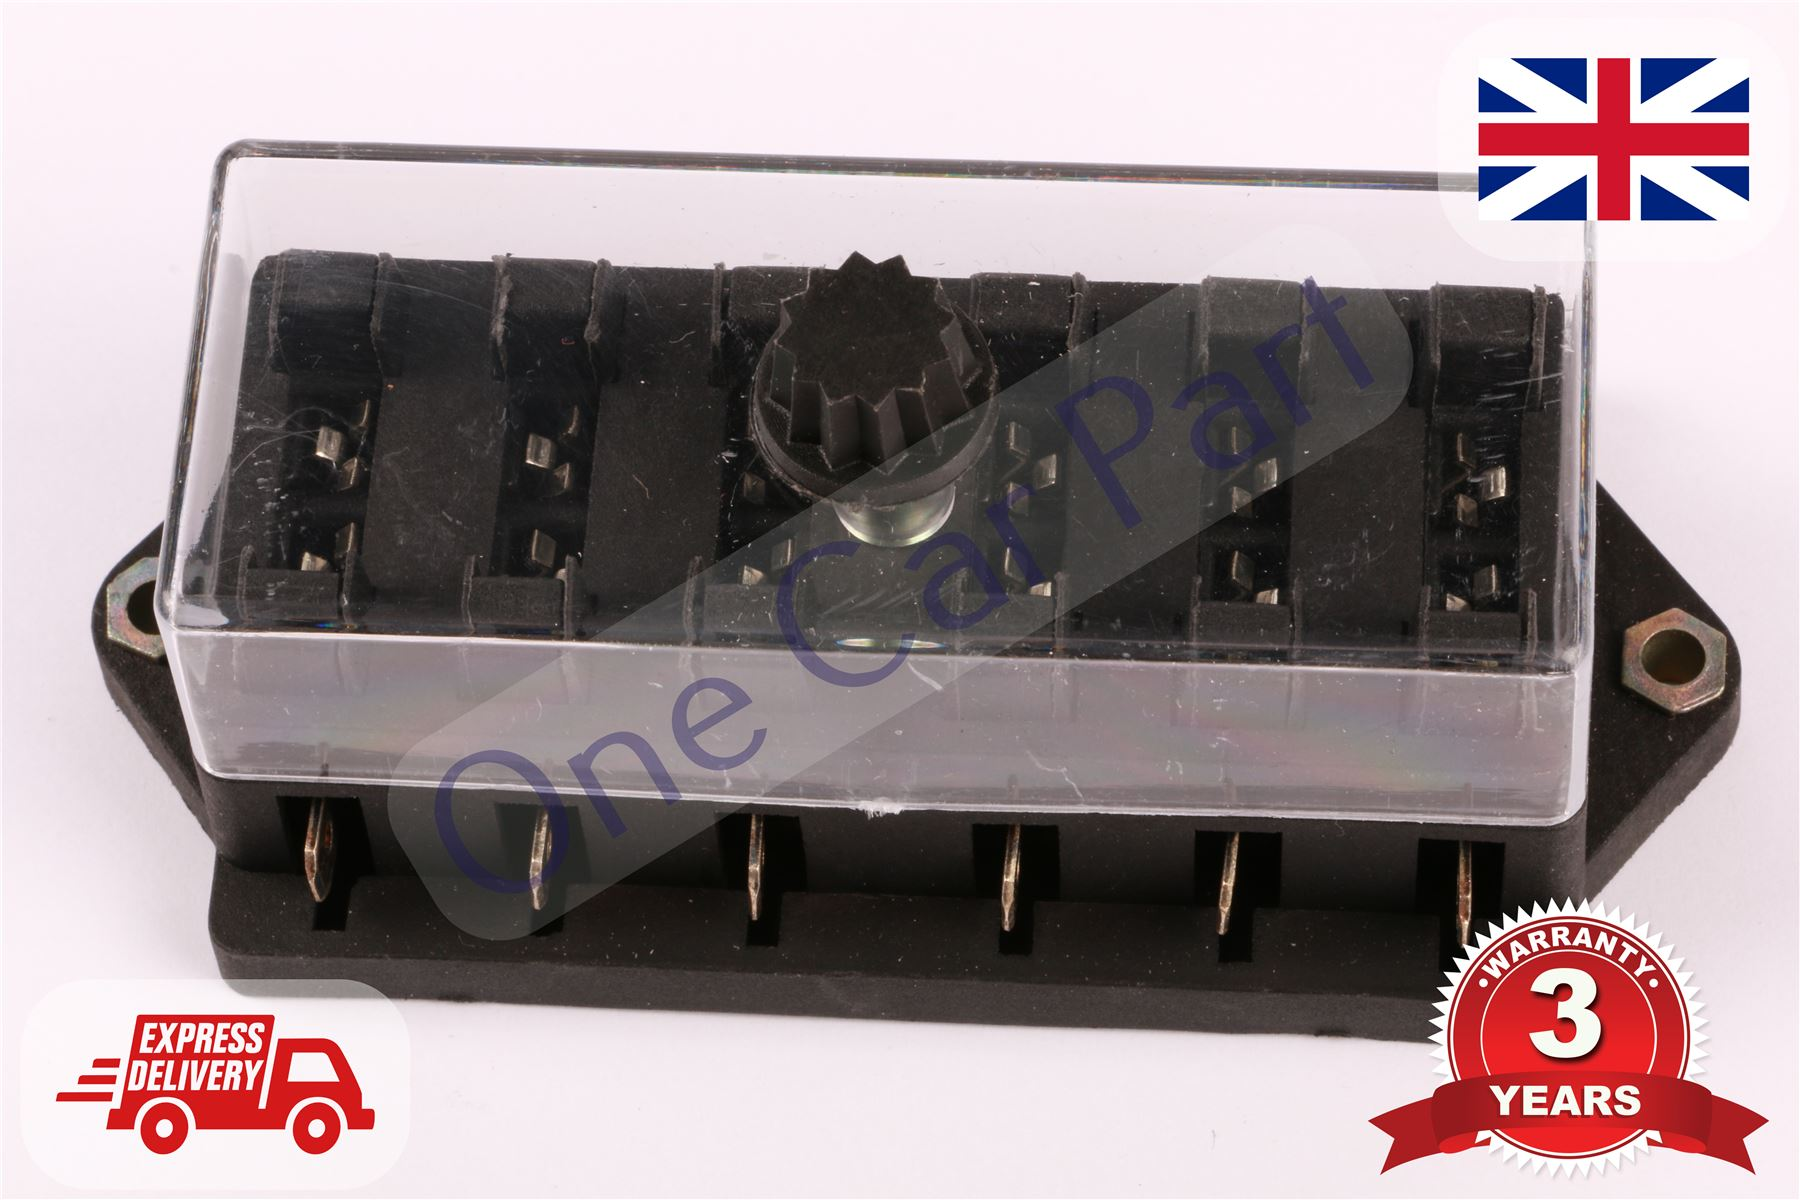 hight resolution of 12v fuse box holder car motorcycle quad bike cars 6 way universal standard